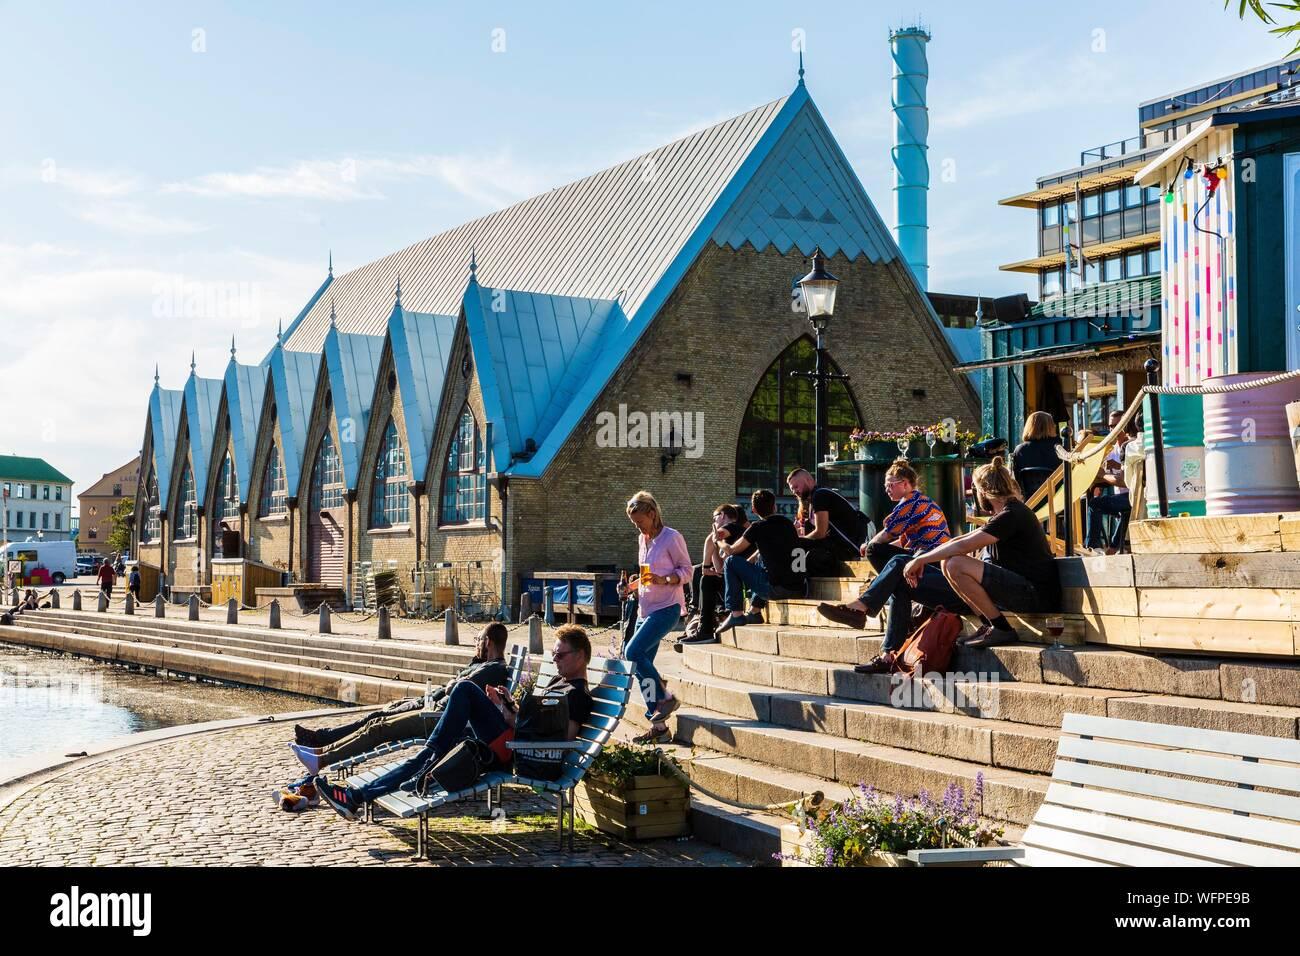 Sweden Vastra Gotaland Goteborg Gothenburg Coffee Near The Fish Church Feskekorka Stock Photo Alamy